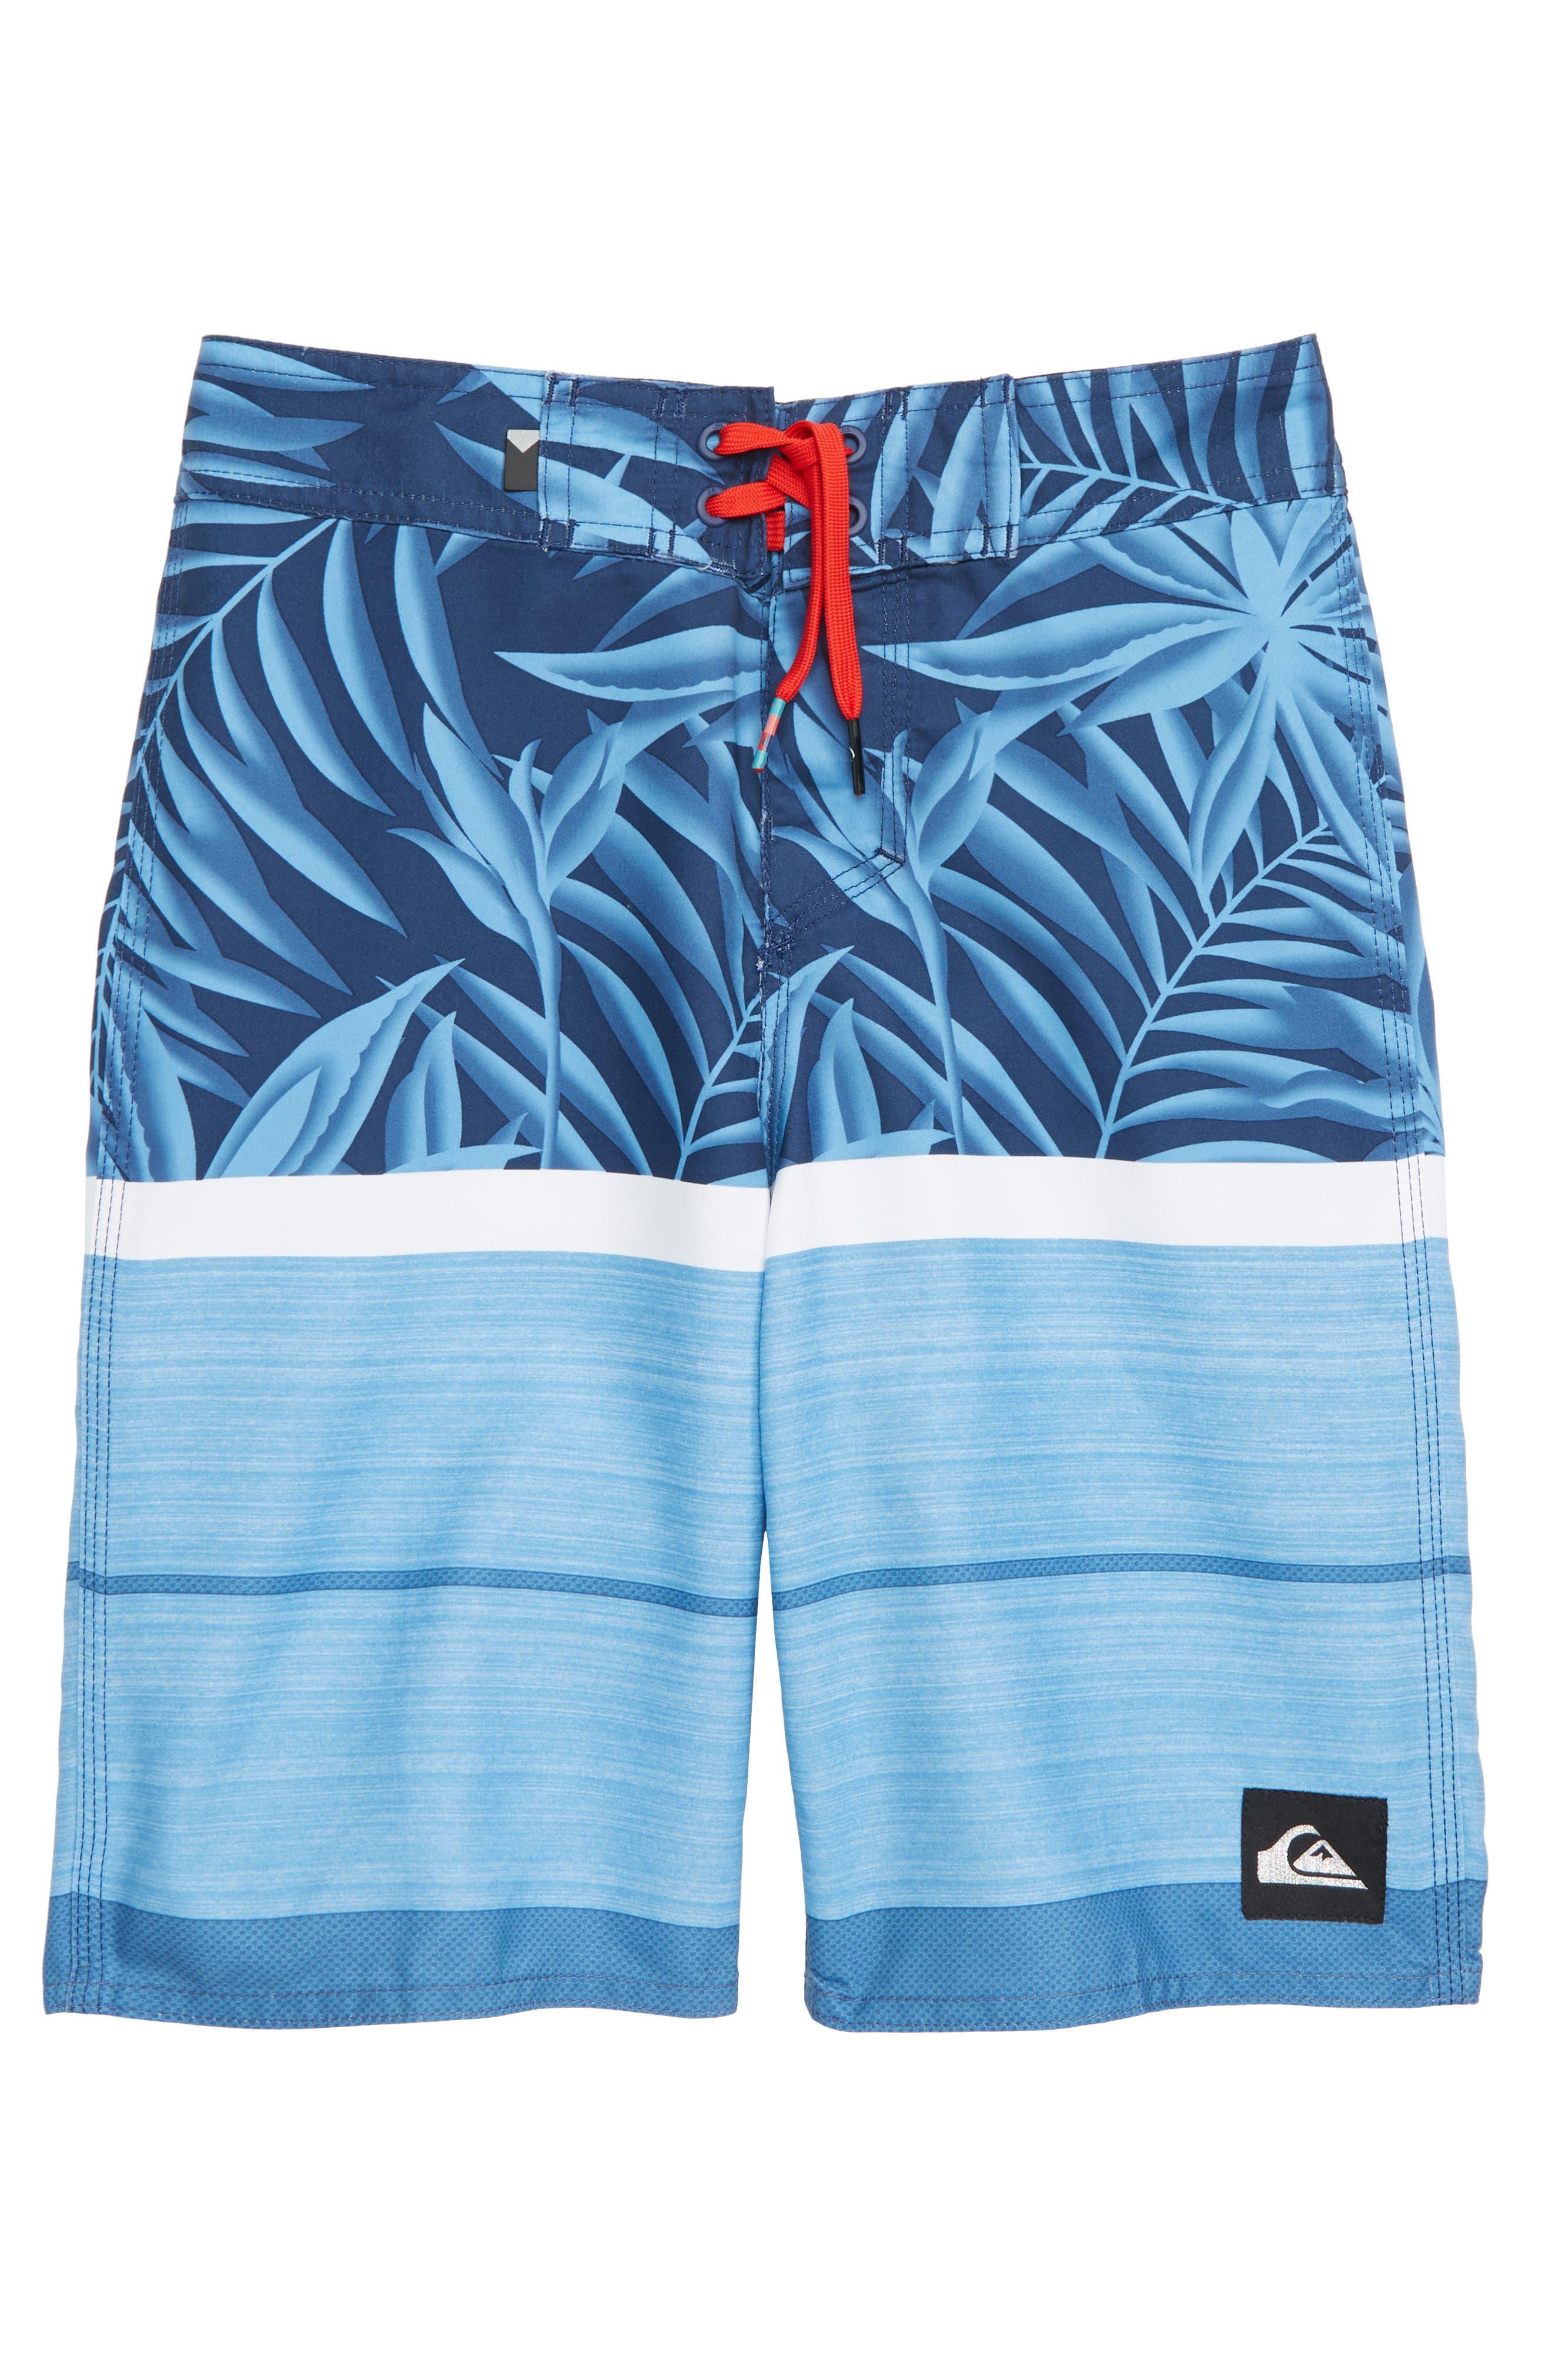 Slab Island Print Board Shorts,                         Main,                         color, MEDIEVEL BLUE